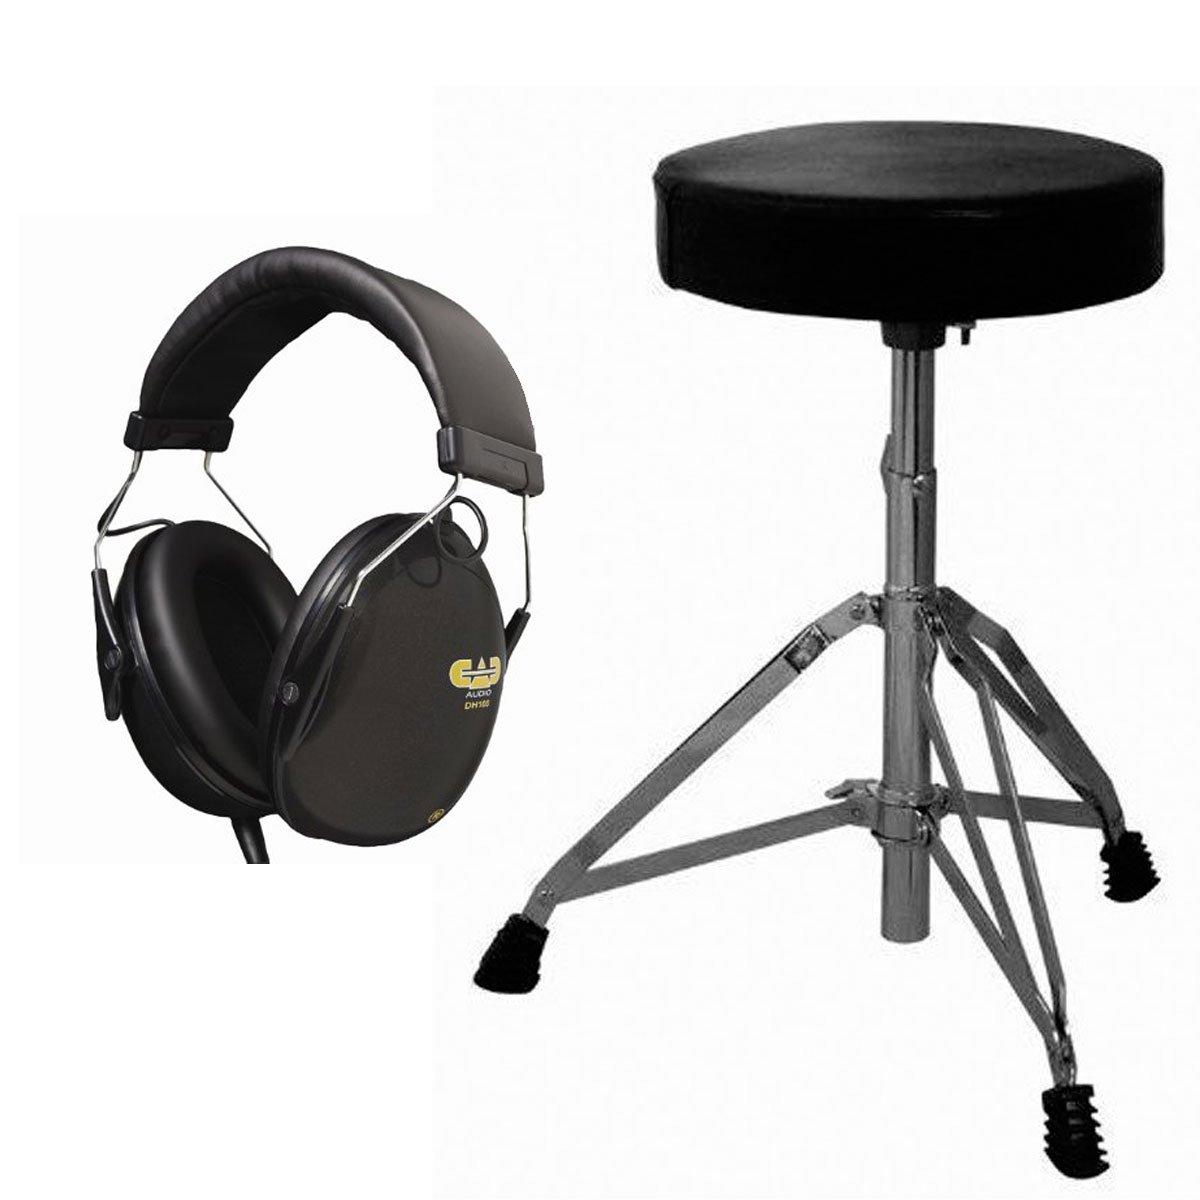 On-Stage MDT2 Double-Braced Drum Throne + CAD Audio DH100 Drummer Isolation Headphones